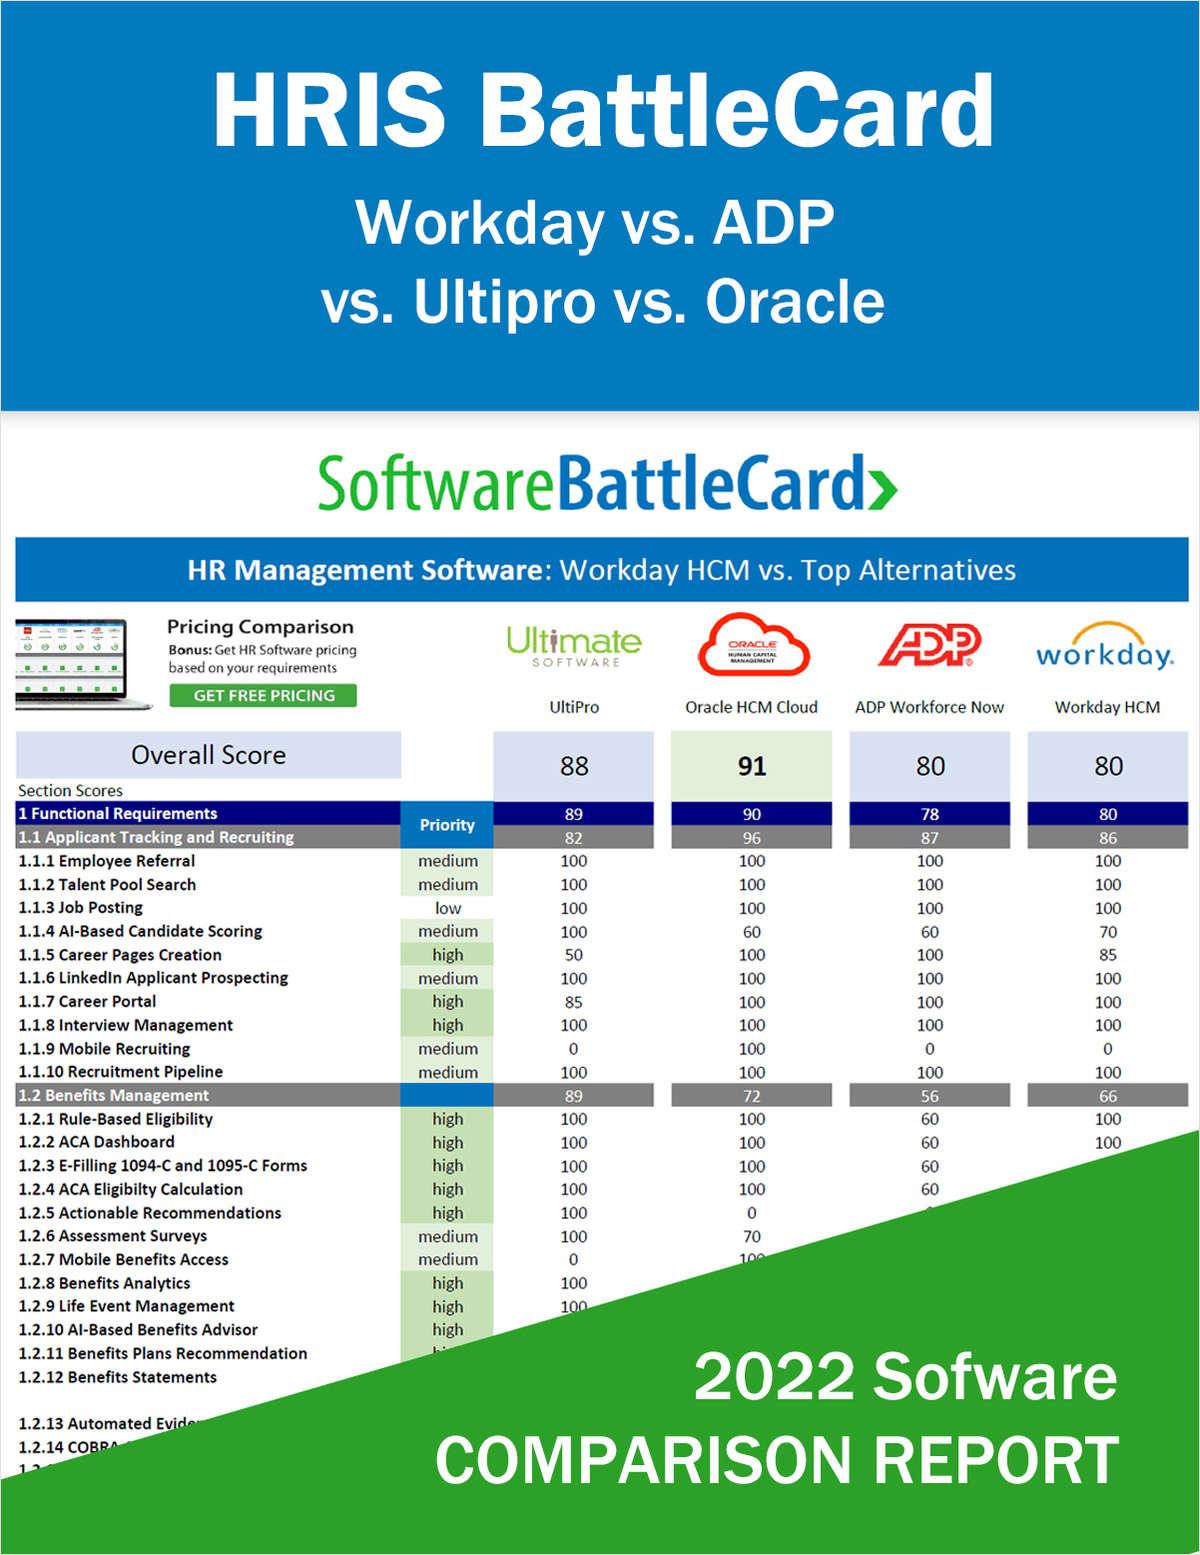 HRIS BattleCard--Workday HCM vs. ADP Workforce Now vs. Ultipro vs. Oracle HCM Cloud